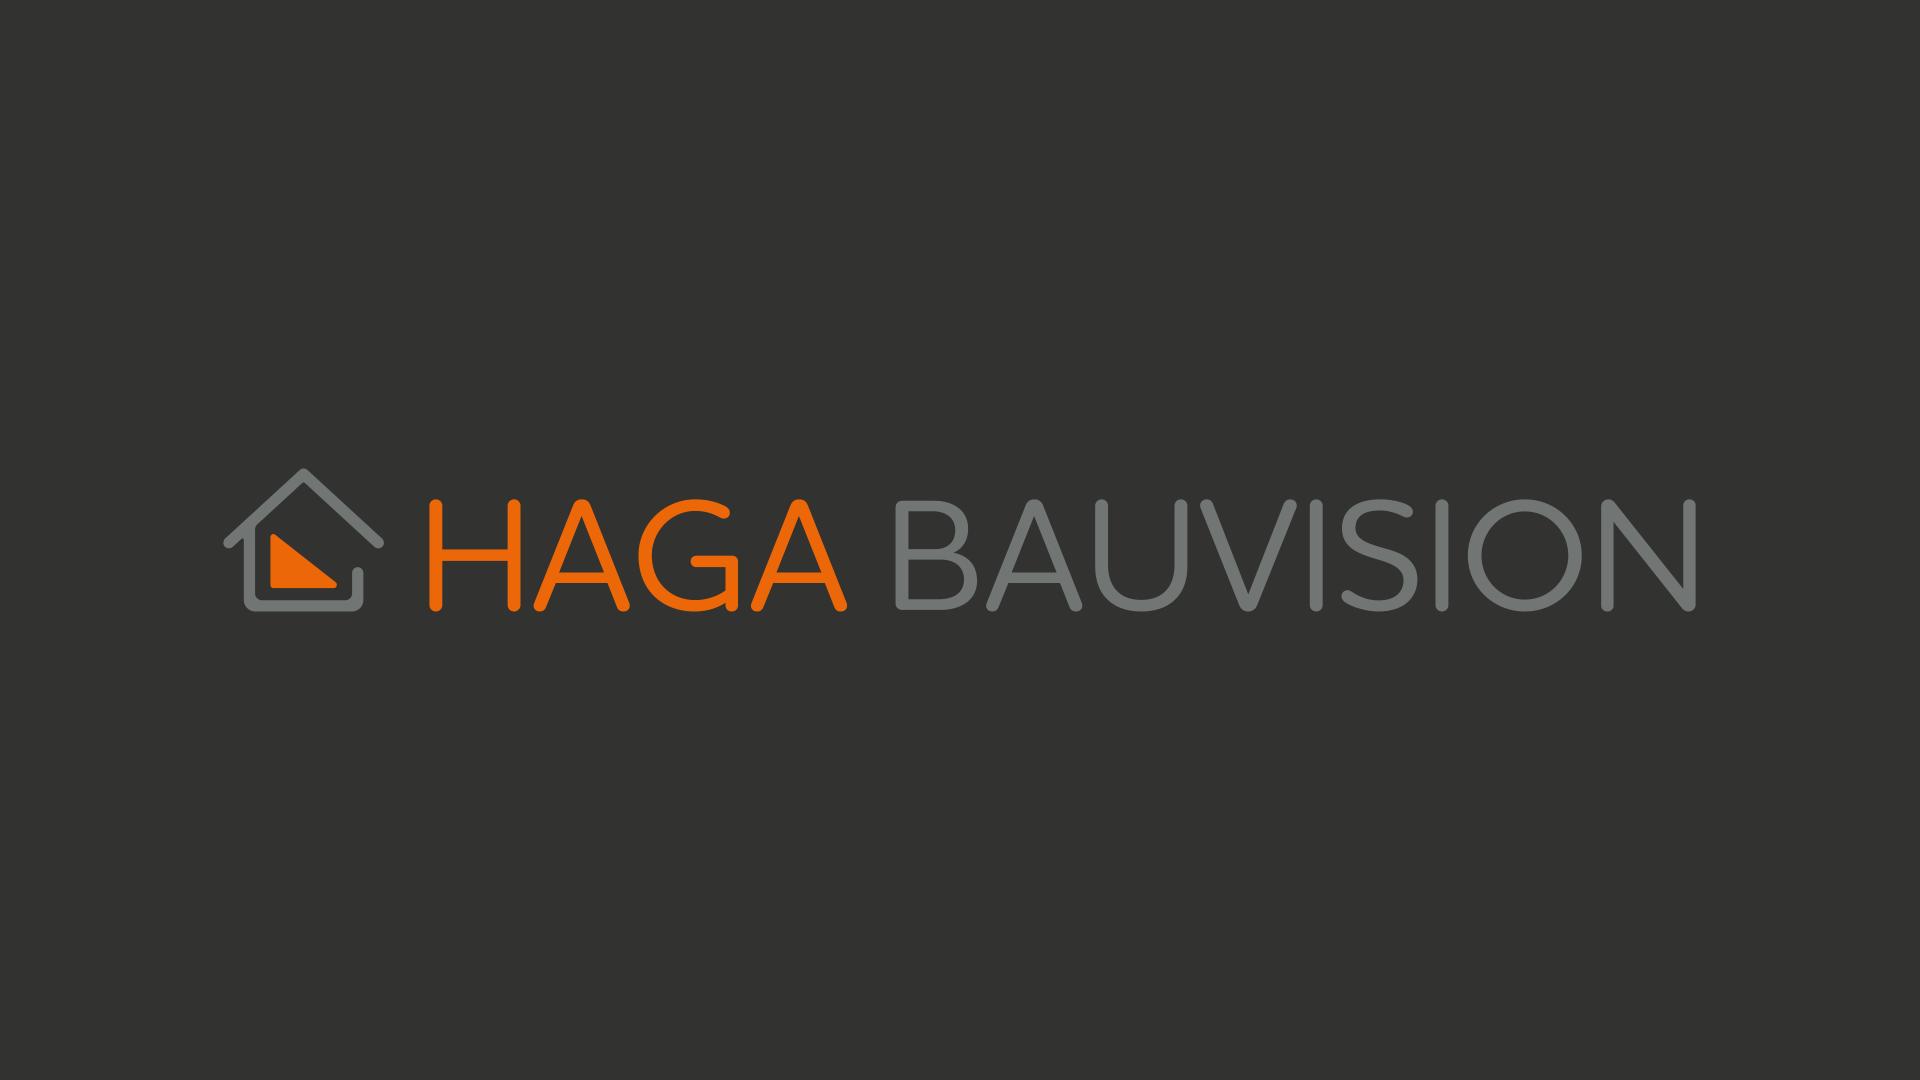 HAGA BAUVISION GbR Logo Design